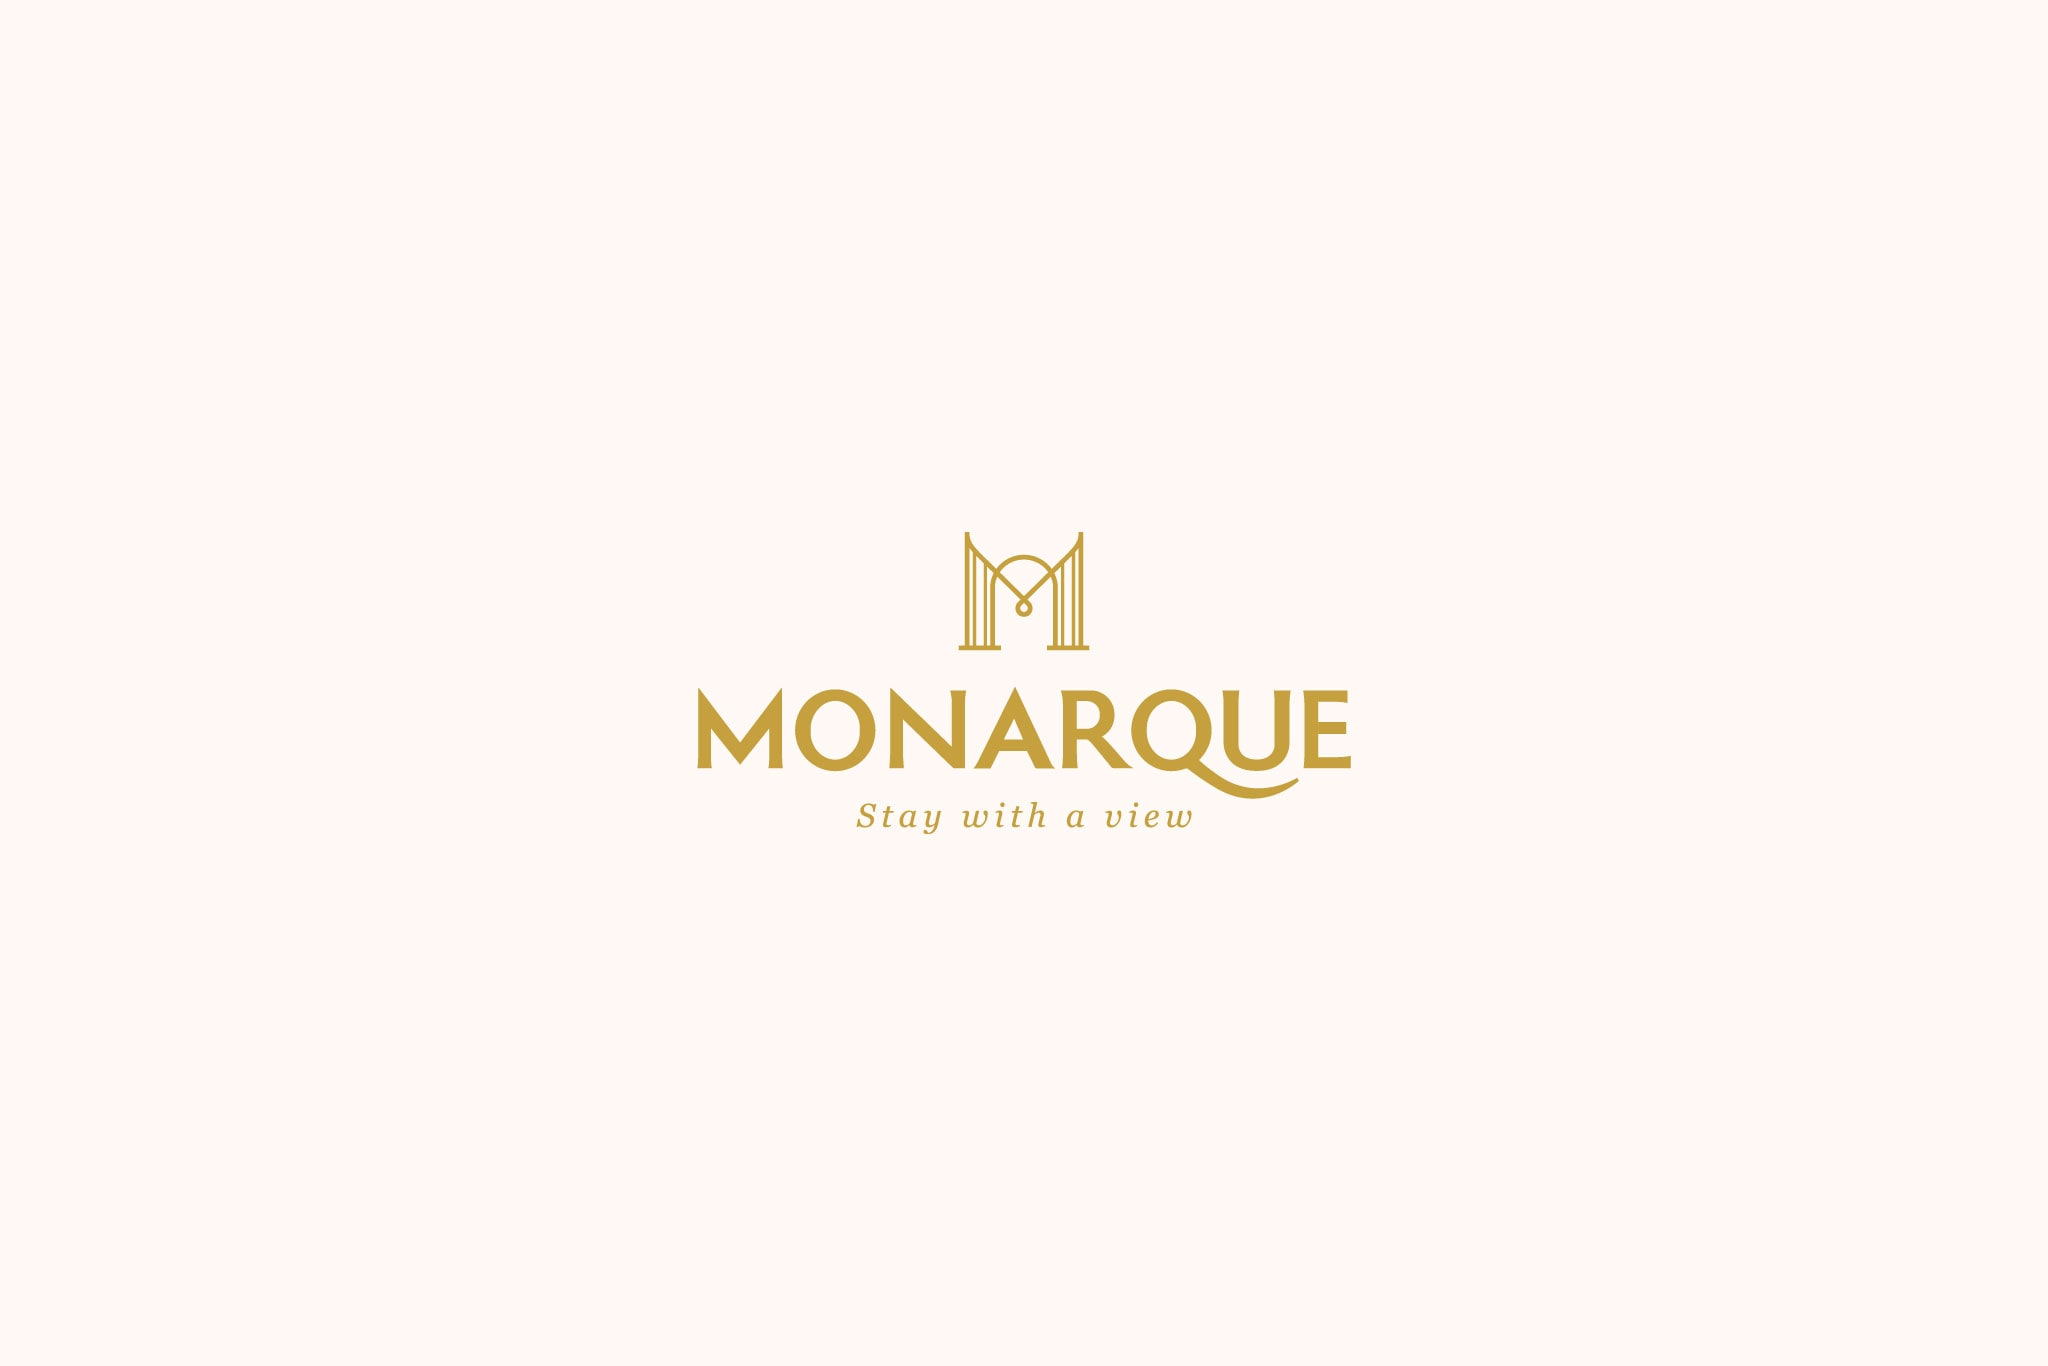 Thiết kế logo khách sạn Monarque